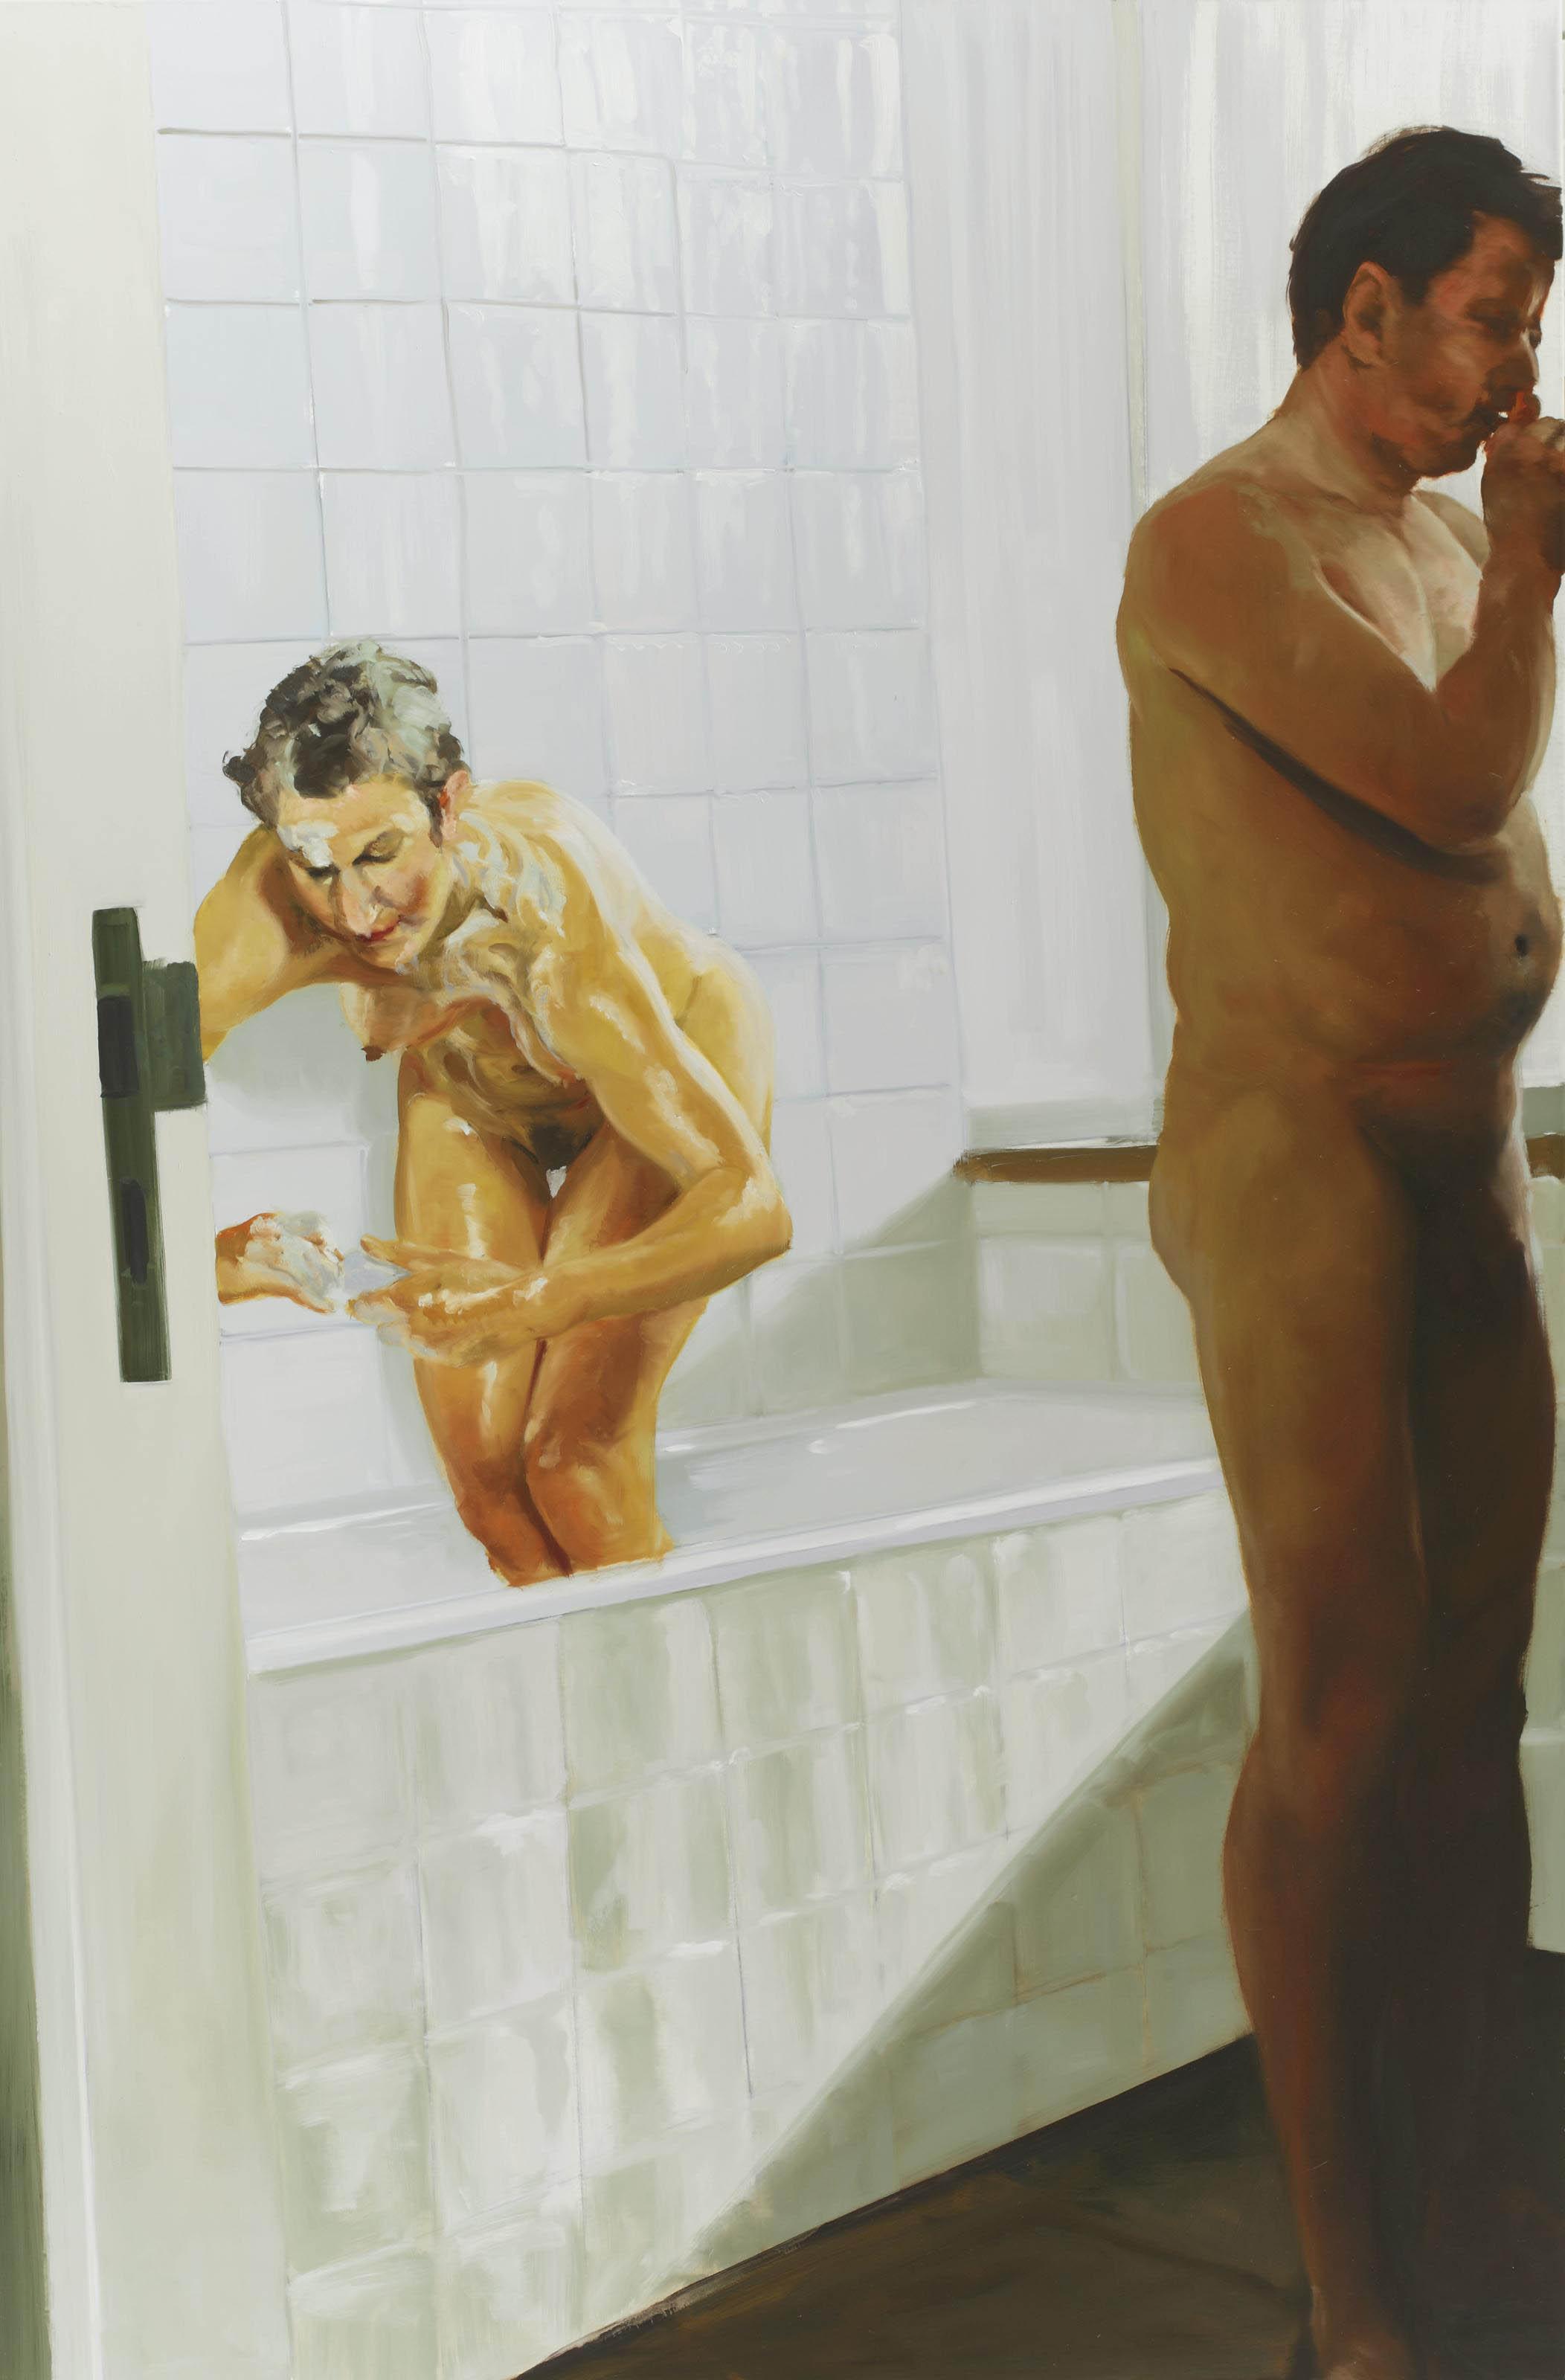 Bathroom scene #3